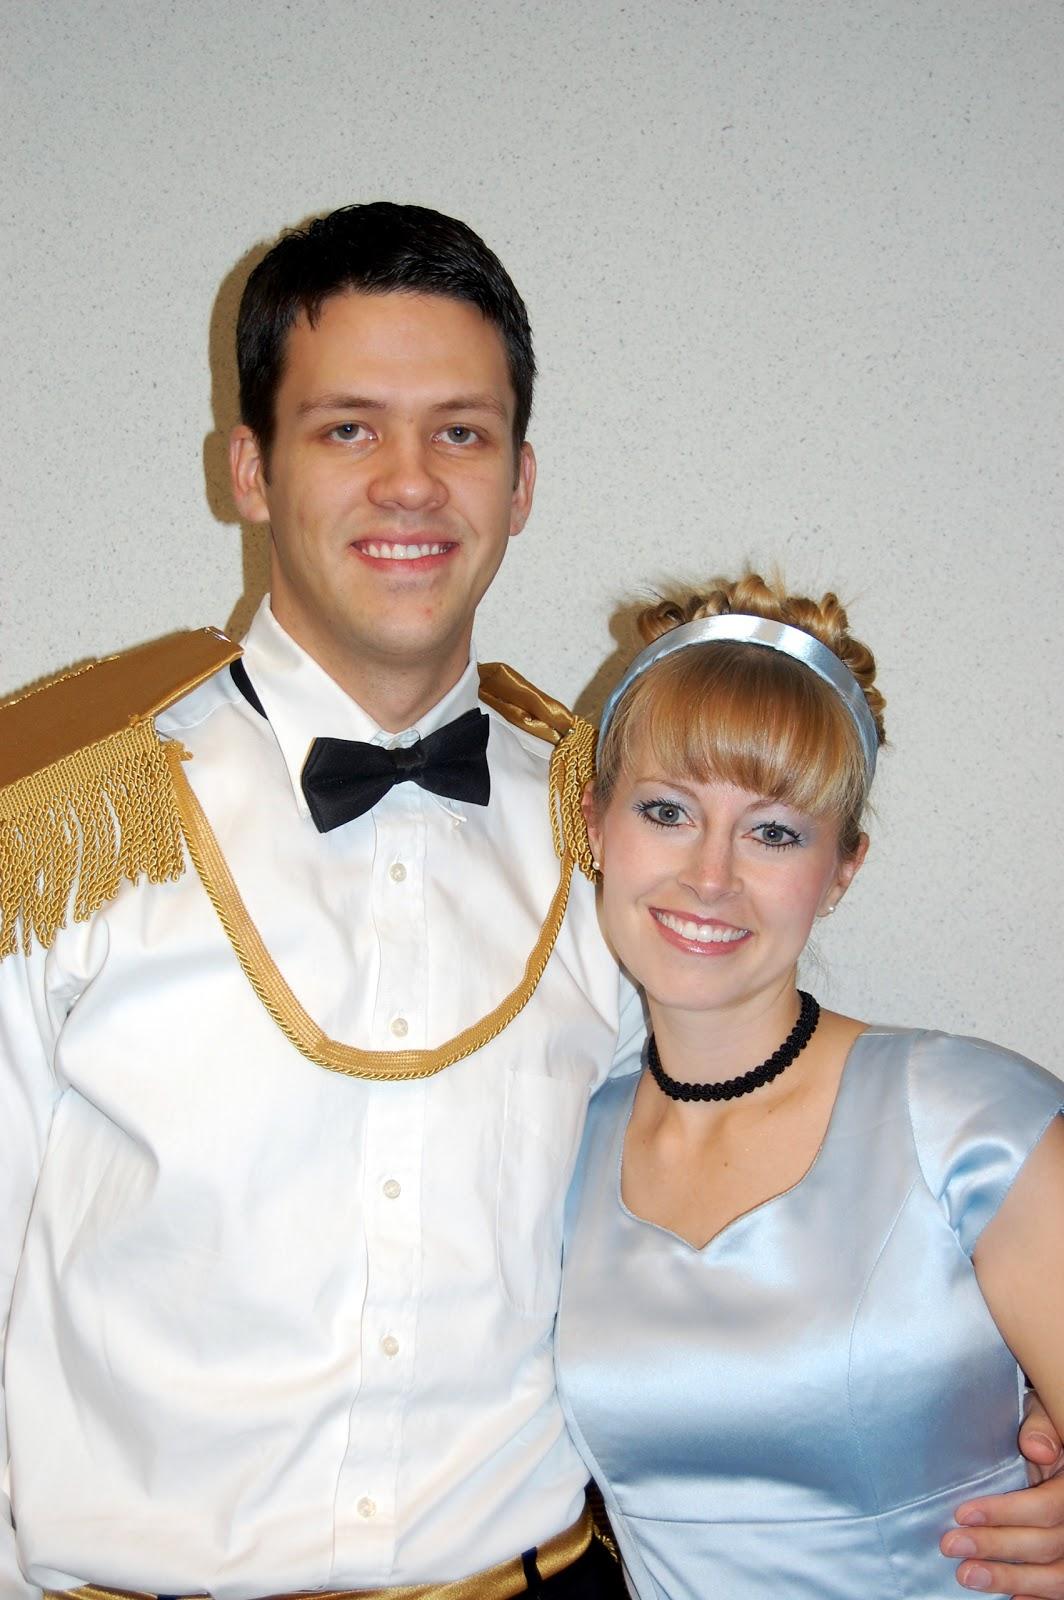 halloween costumes cinderella and prince charming - Prince Charming Halloween Costumes